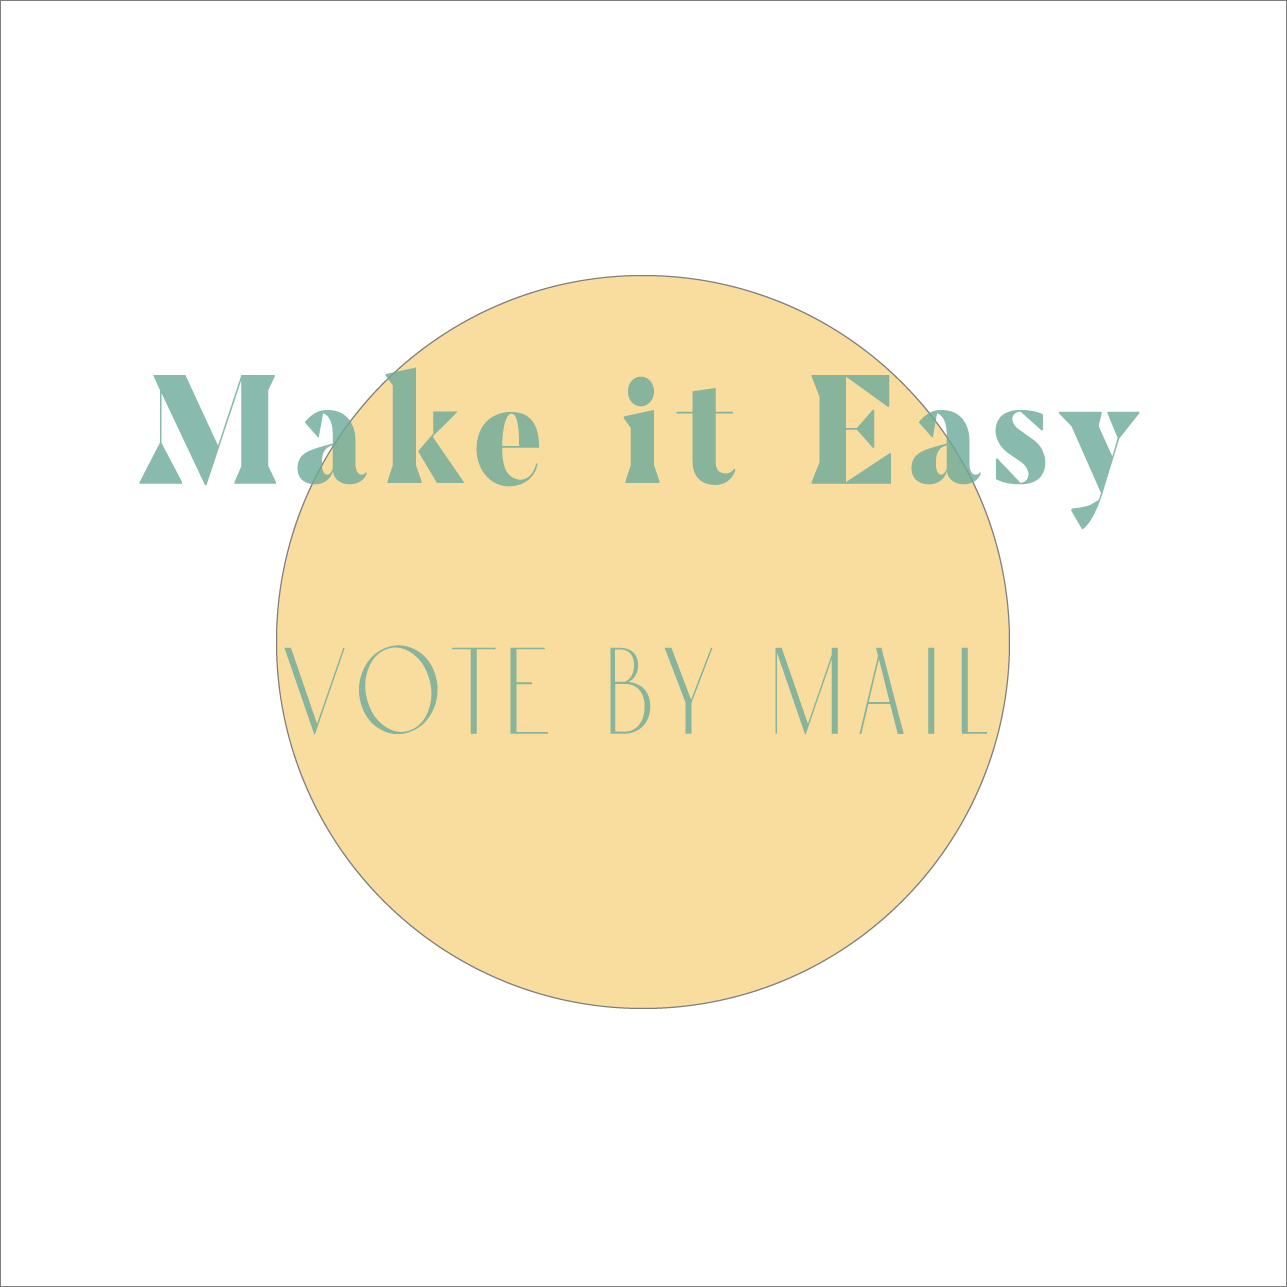 make it easy (new font)